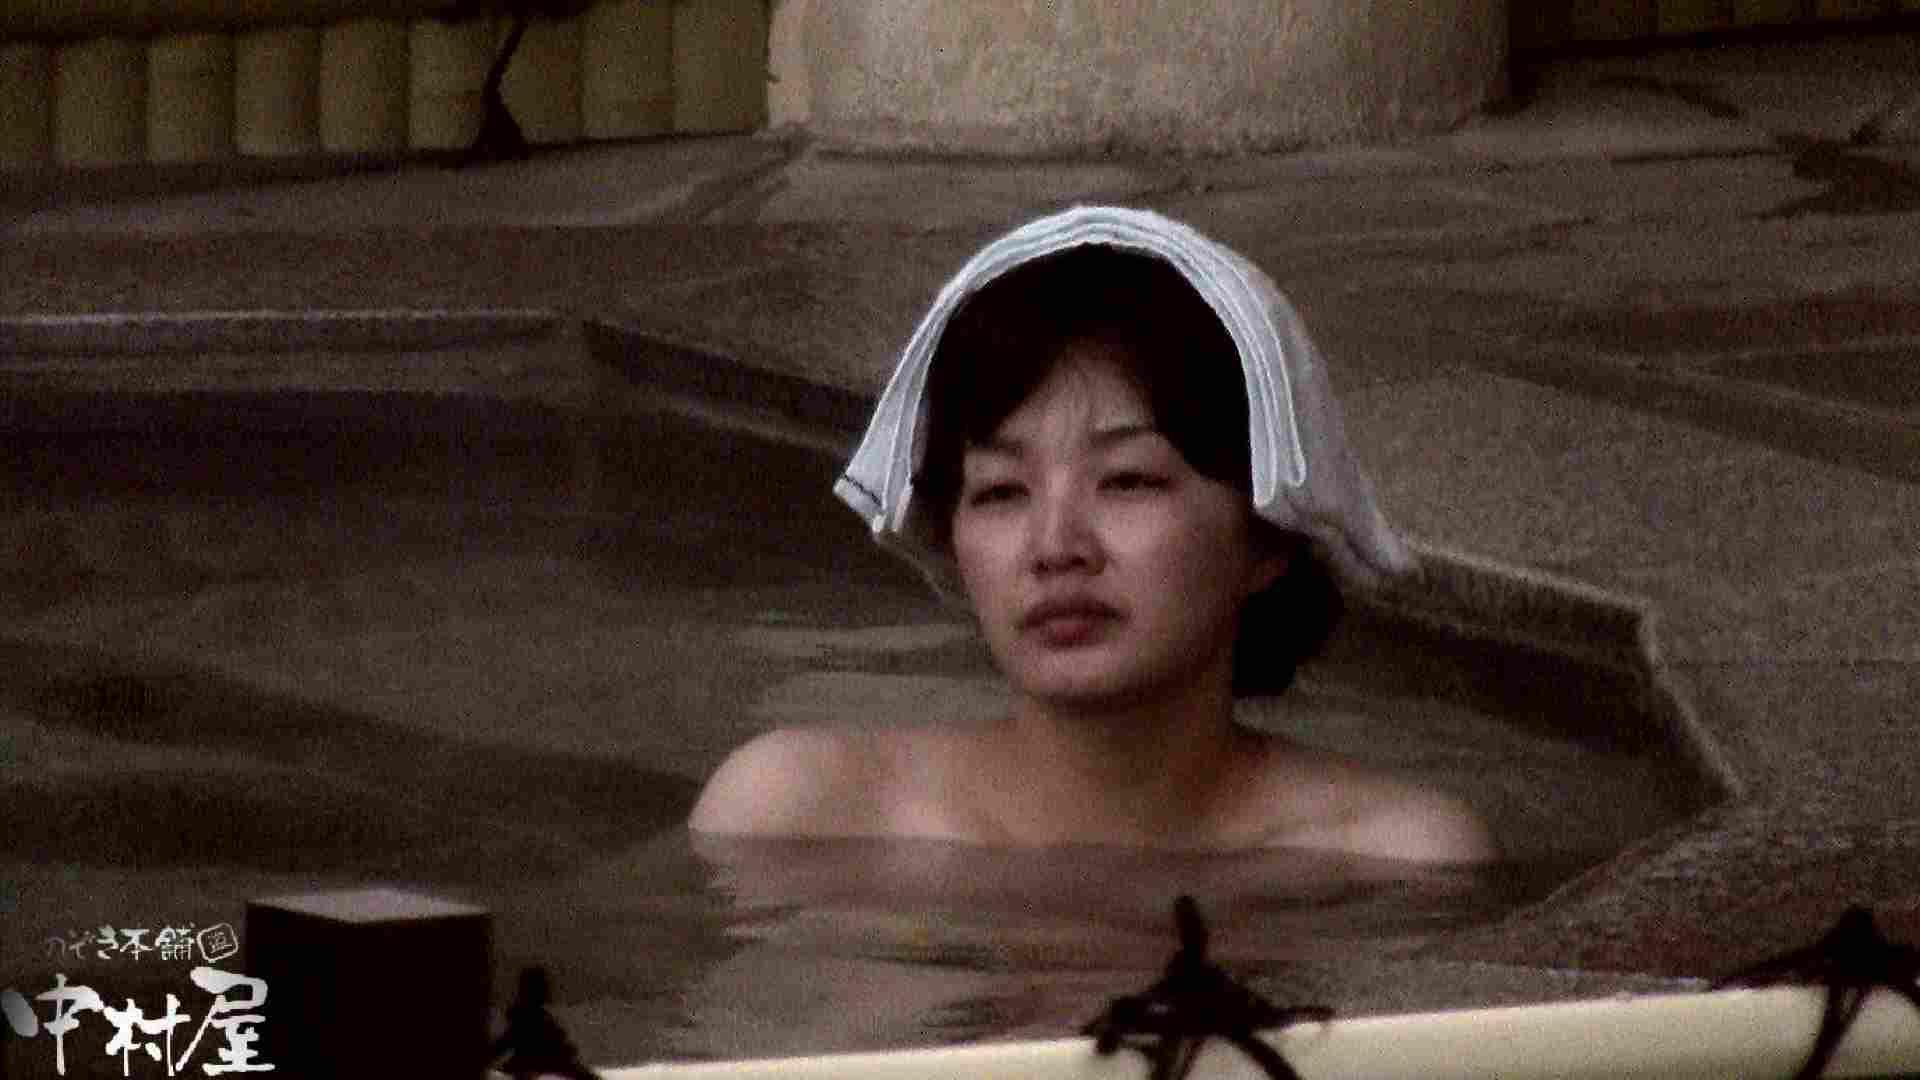 Aquaな露天風呂Vol.916 いやらしいOL | 0  75連発 5